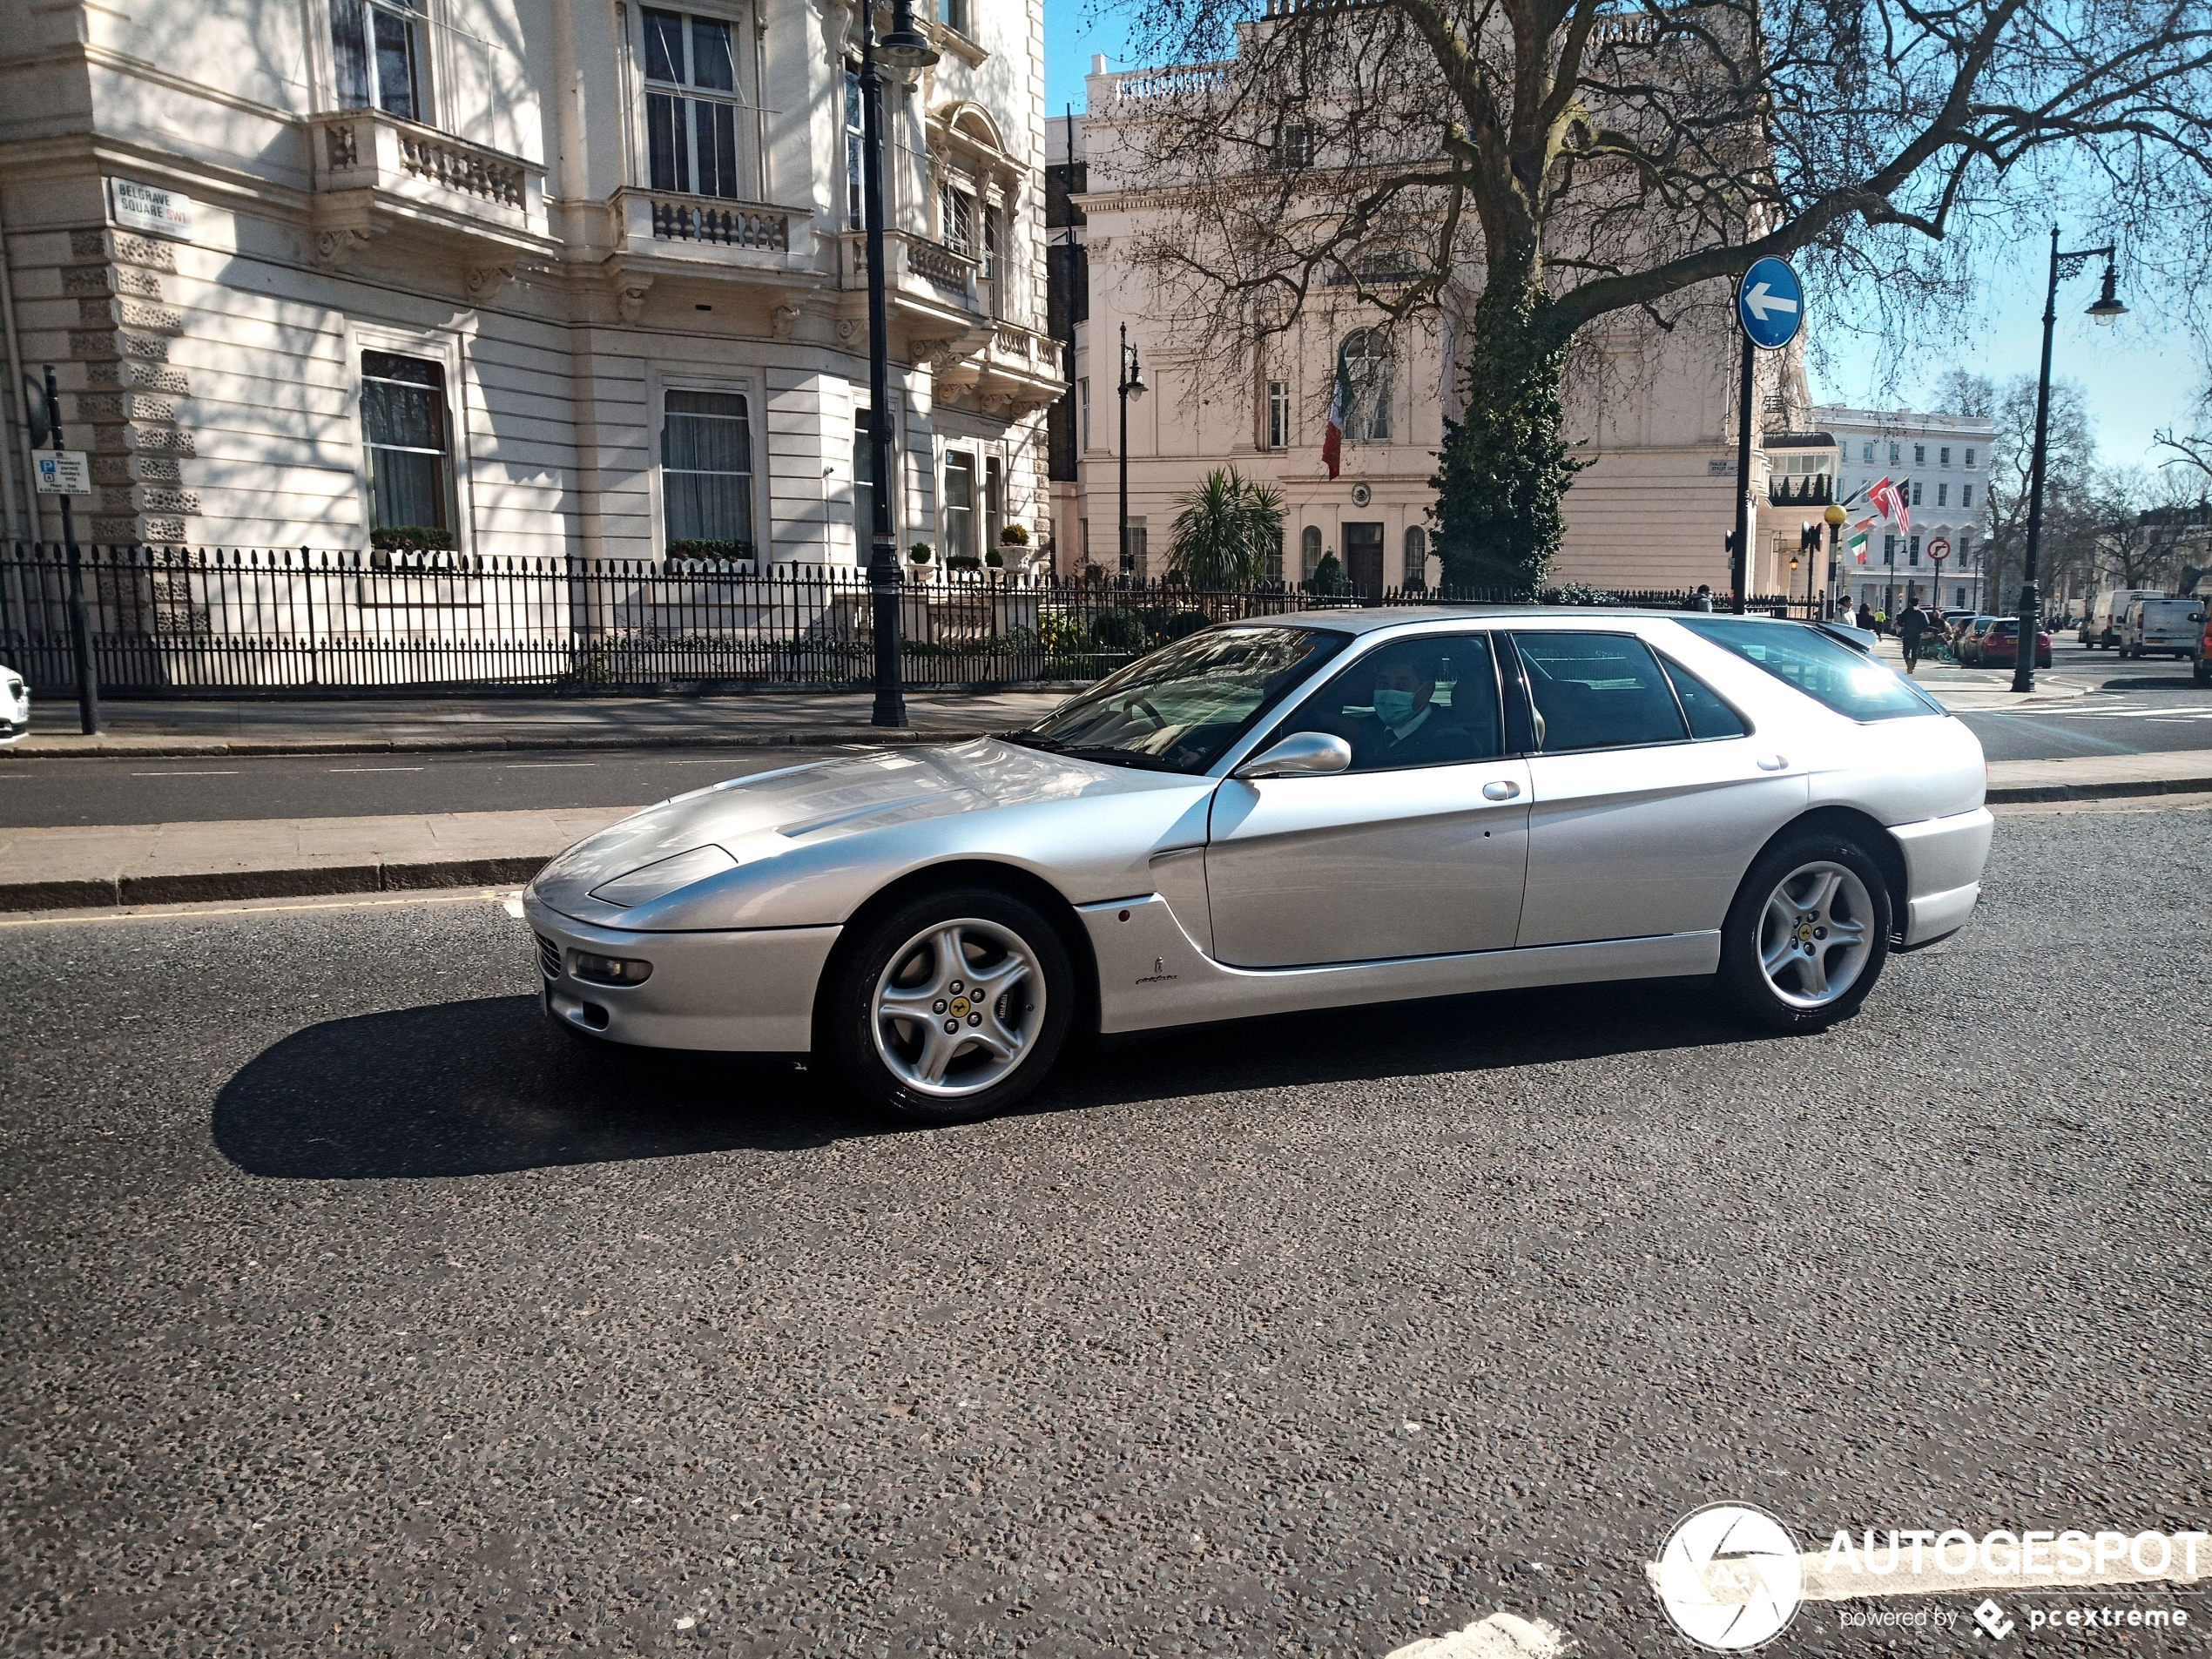 Ferrari 456 GT Venice is still driving around London